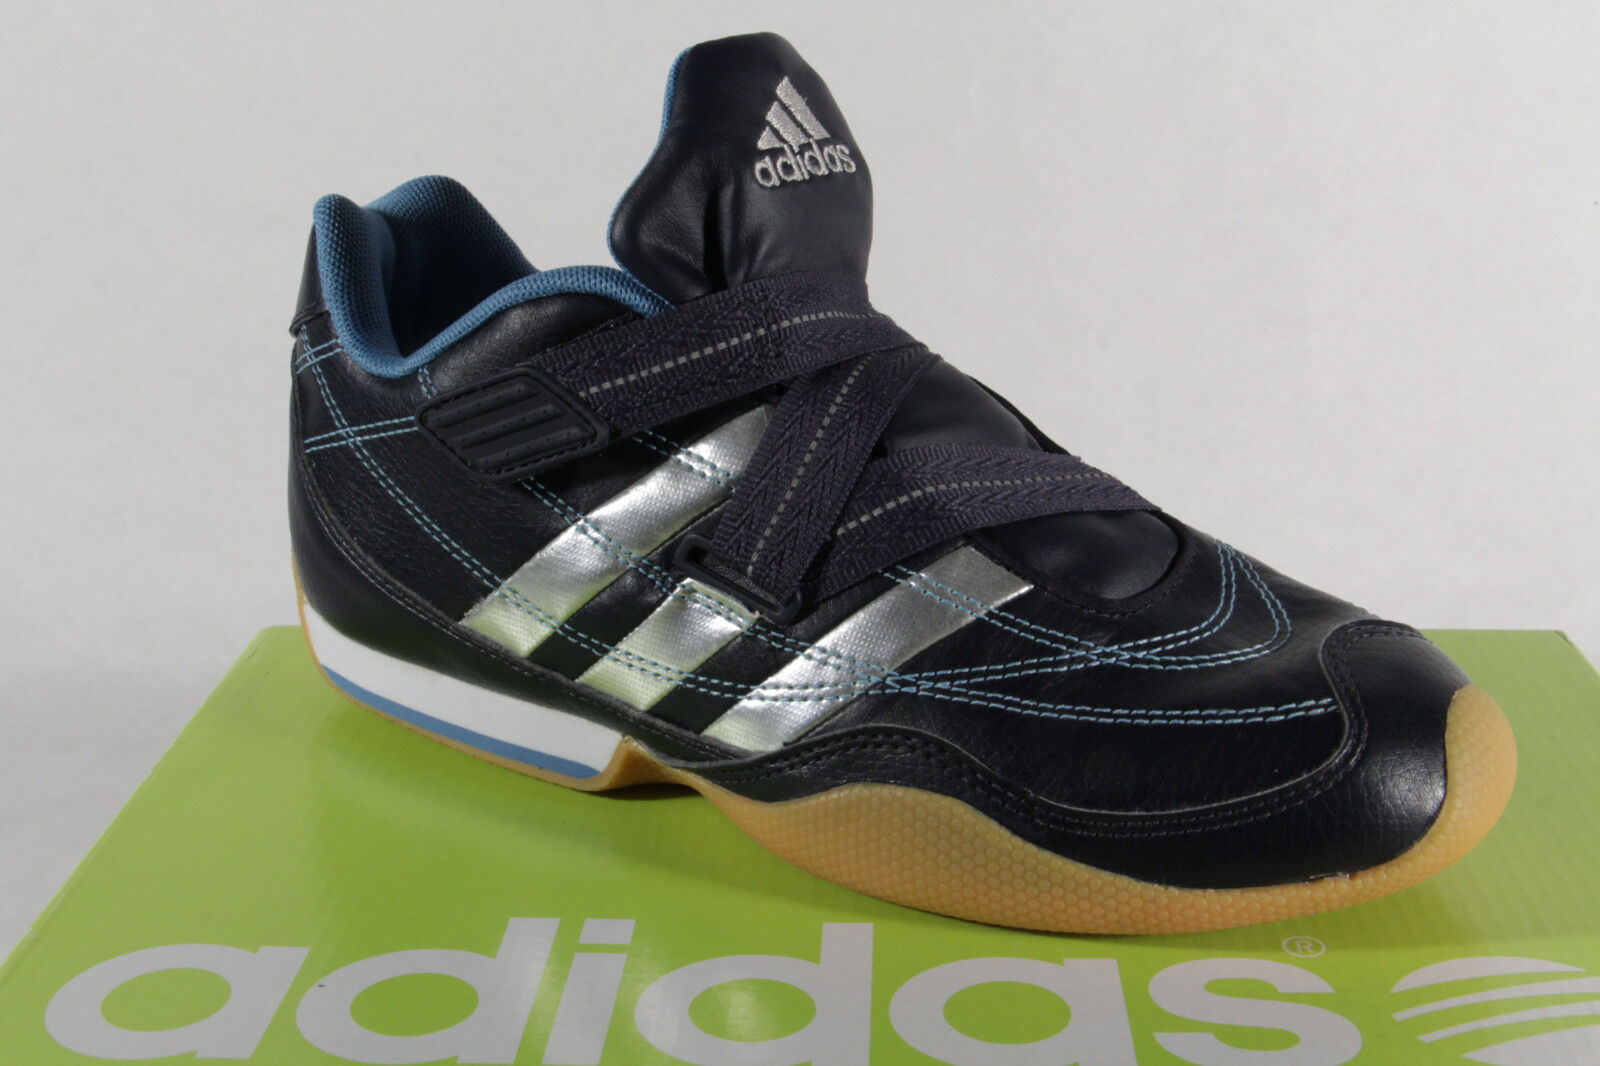 Adidas Magyar kék tréning futócipő NEU